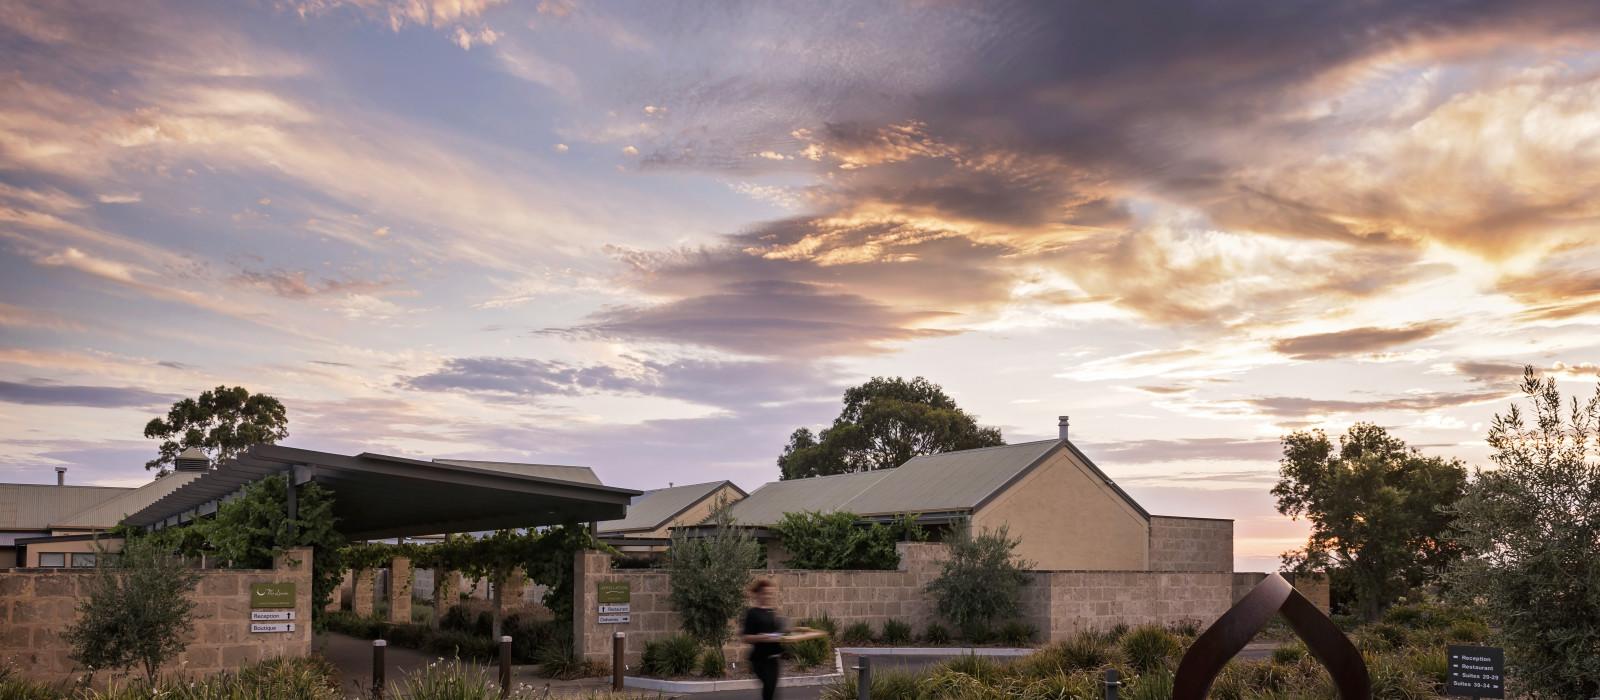 Hotel The Louise Barossa Valley Australien